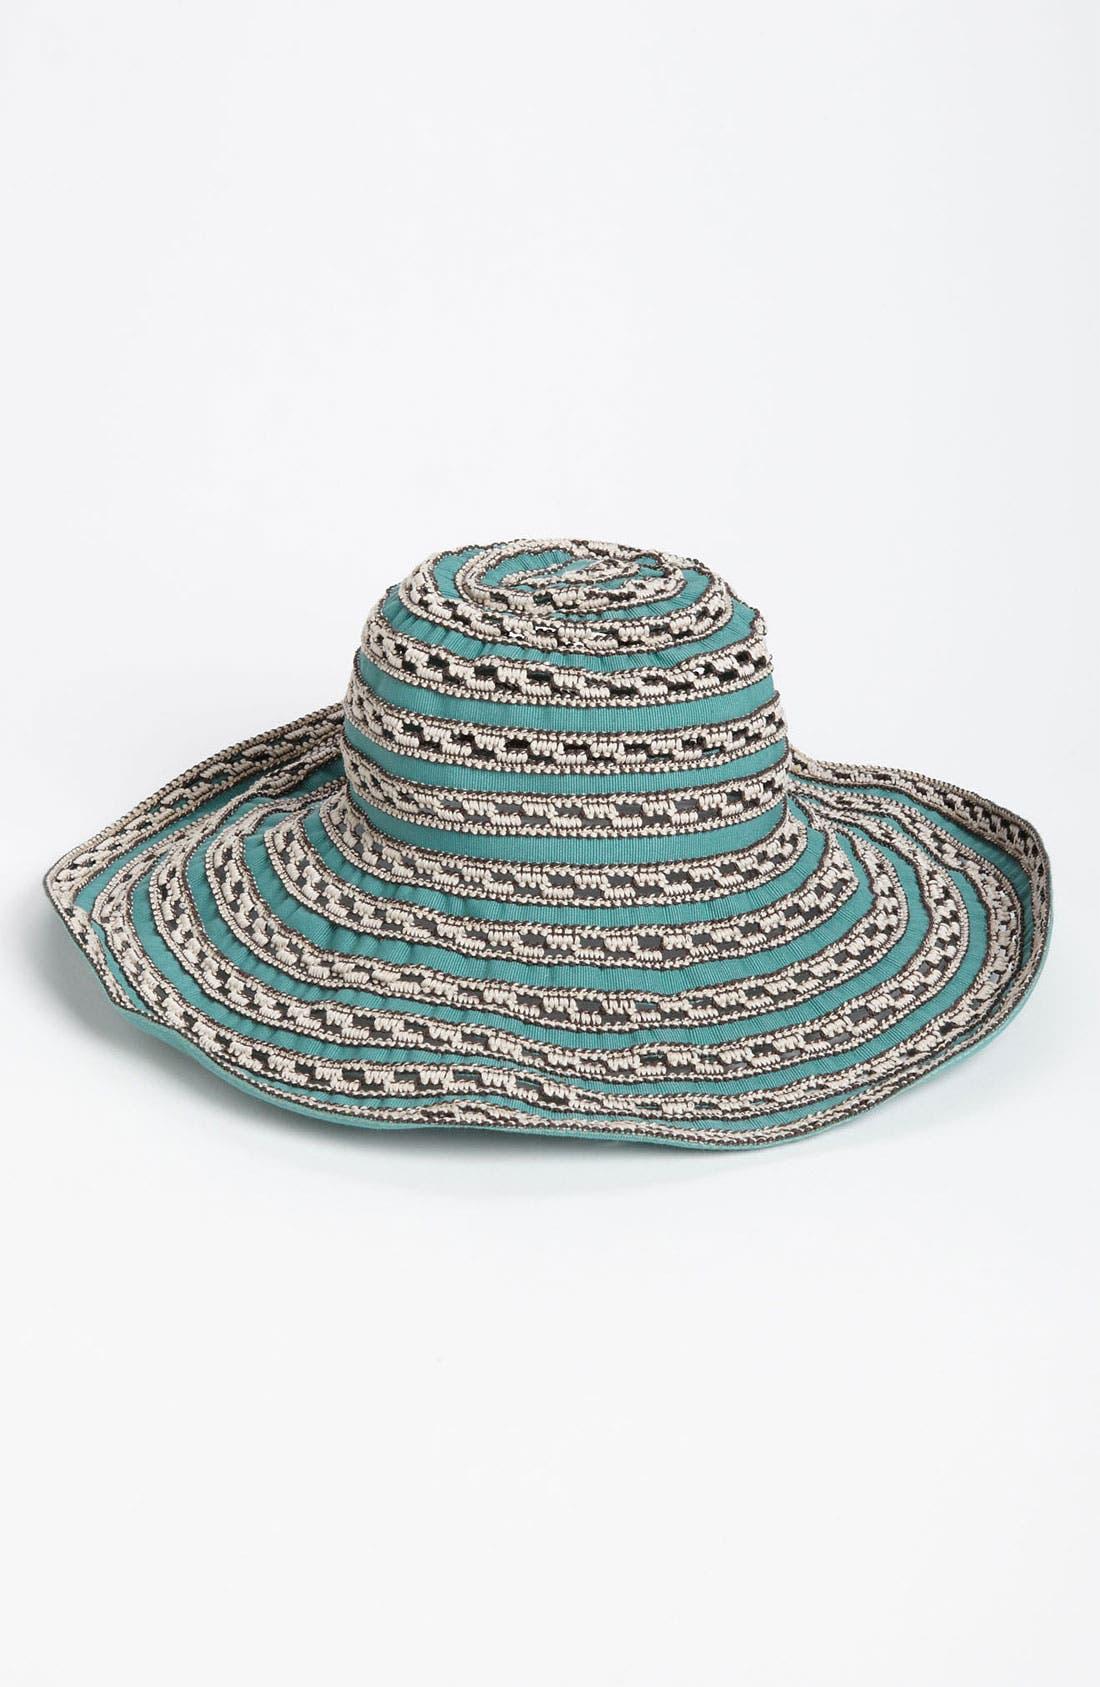 Alternate Image 1 Selected - Nordstrom 'Capello' Floppy Hat